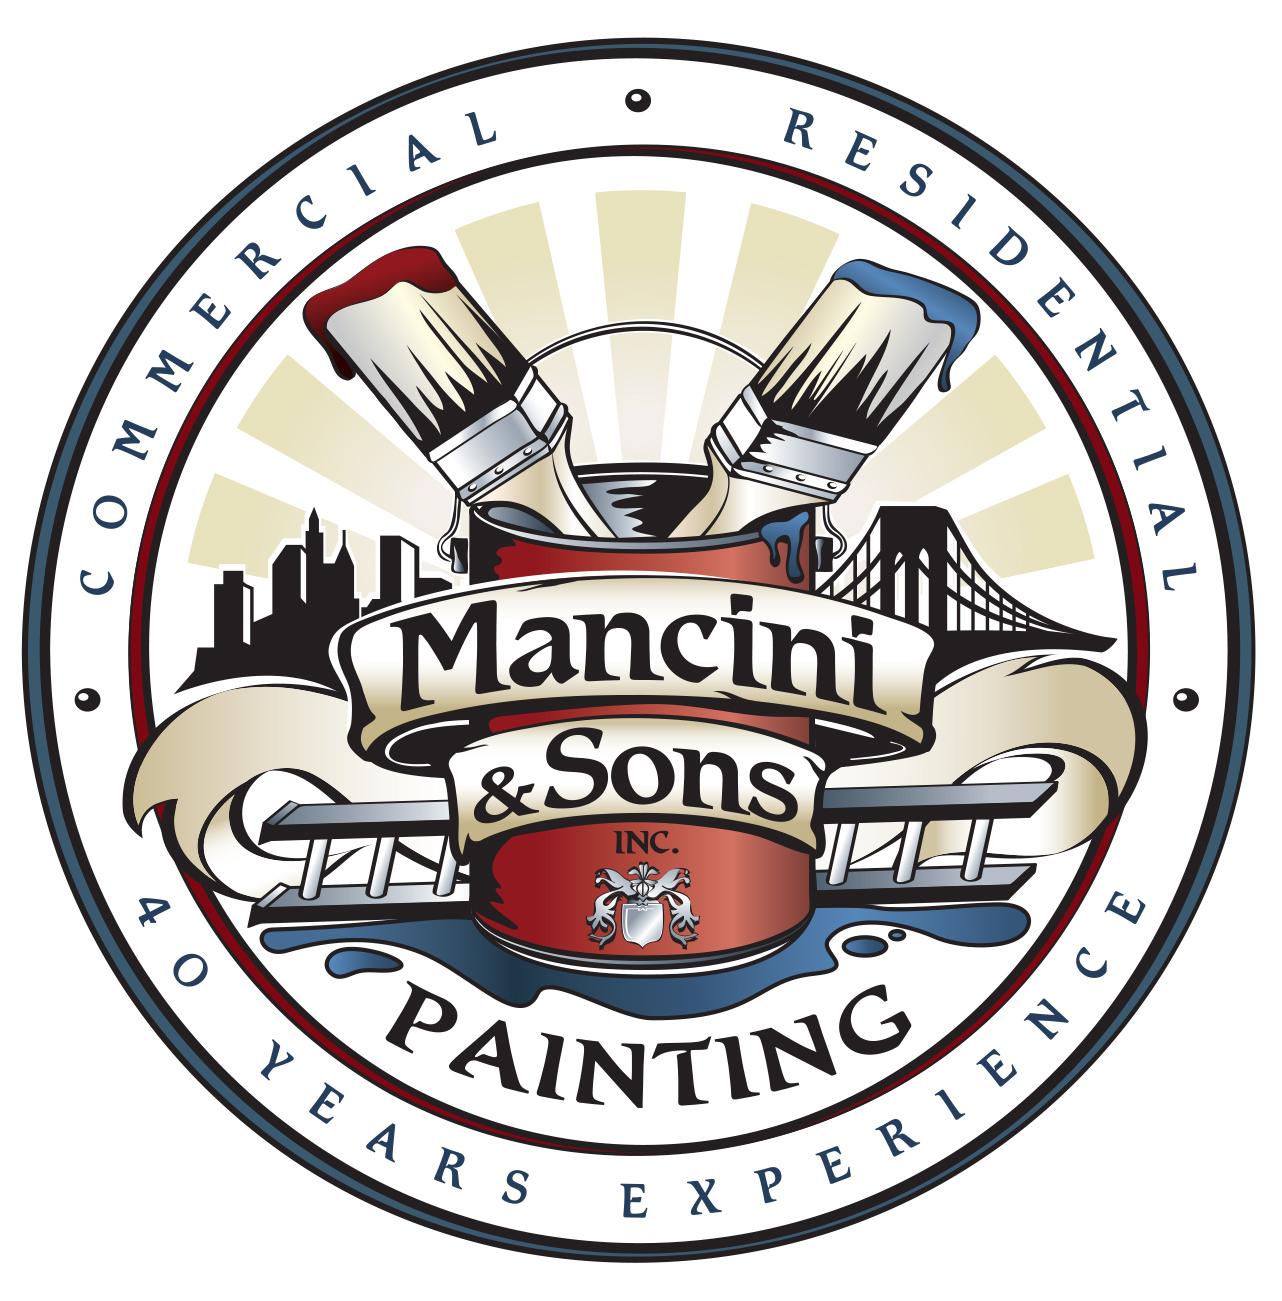 mancini&sons-logo-color-final.jpg